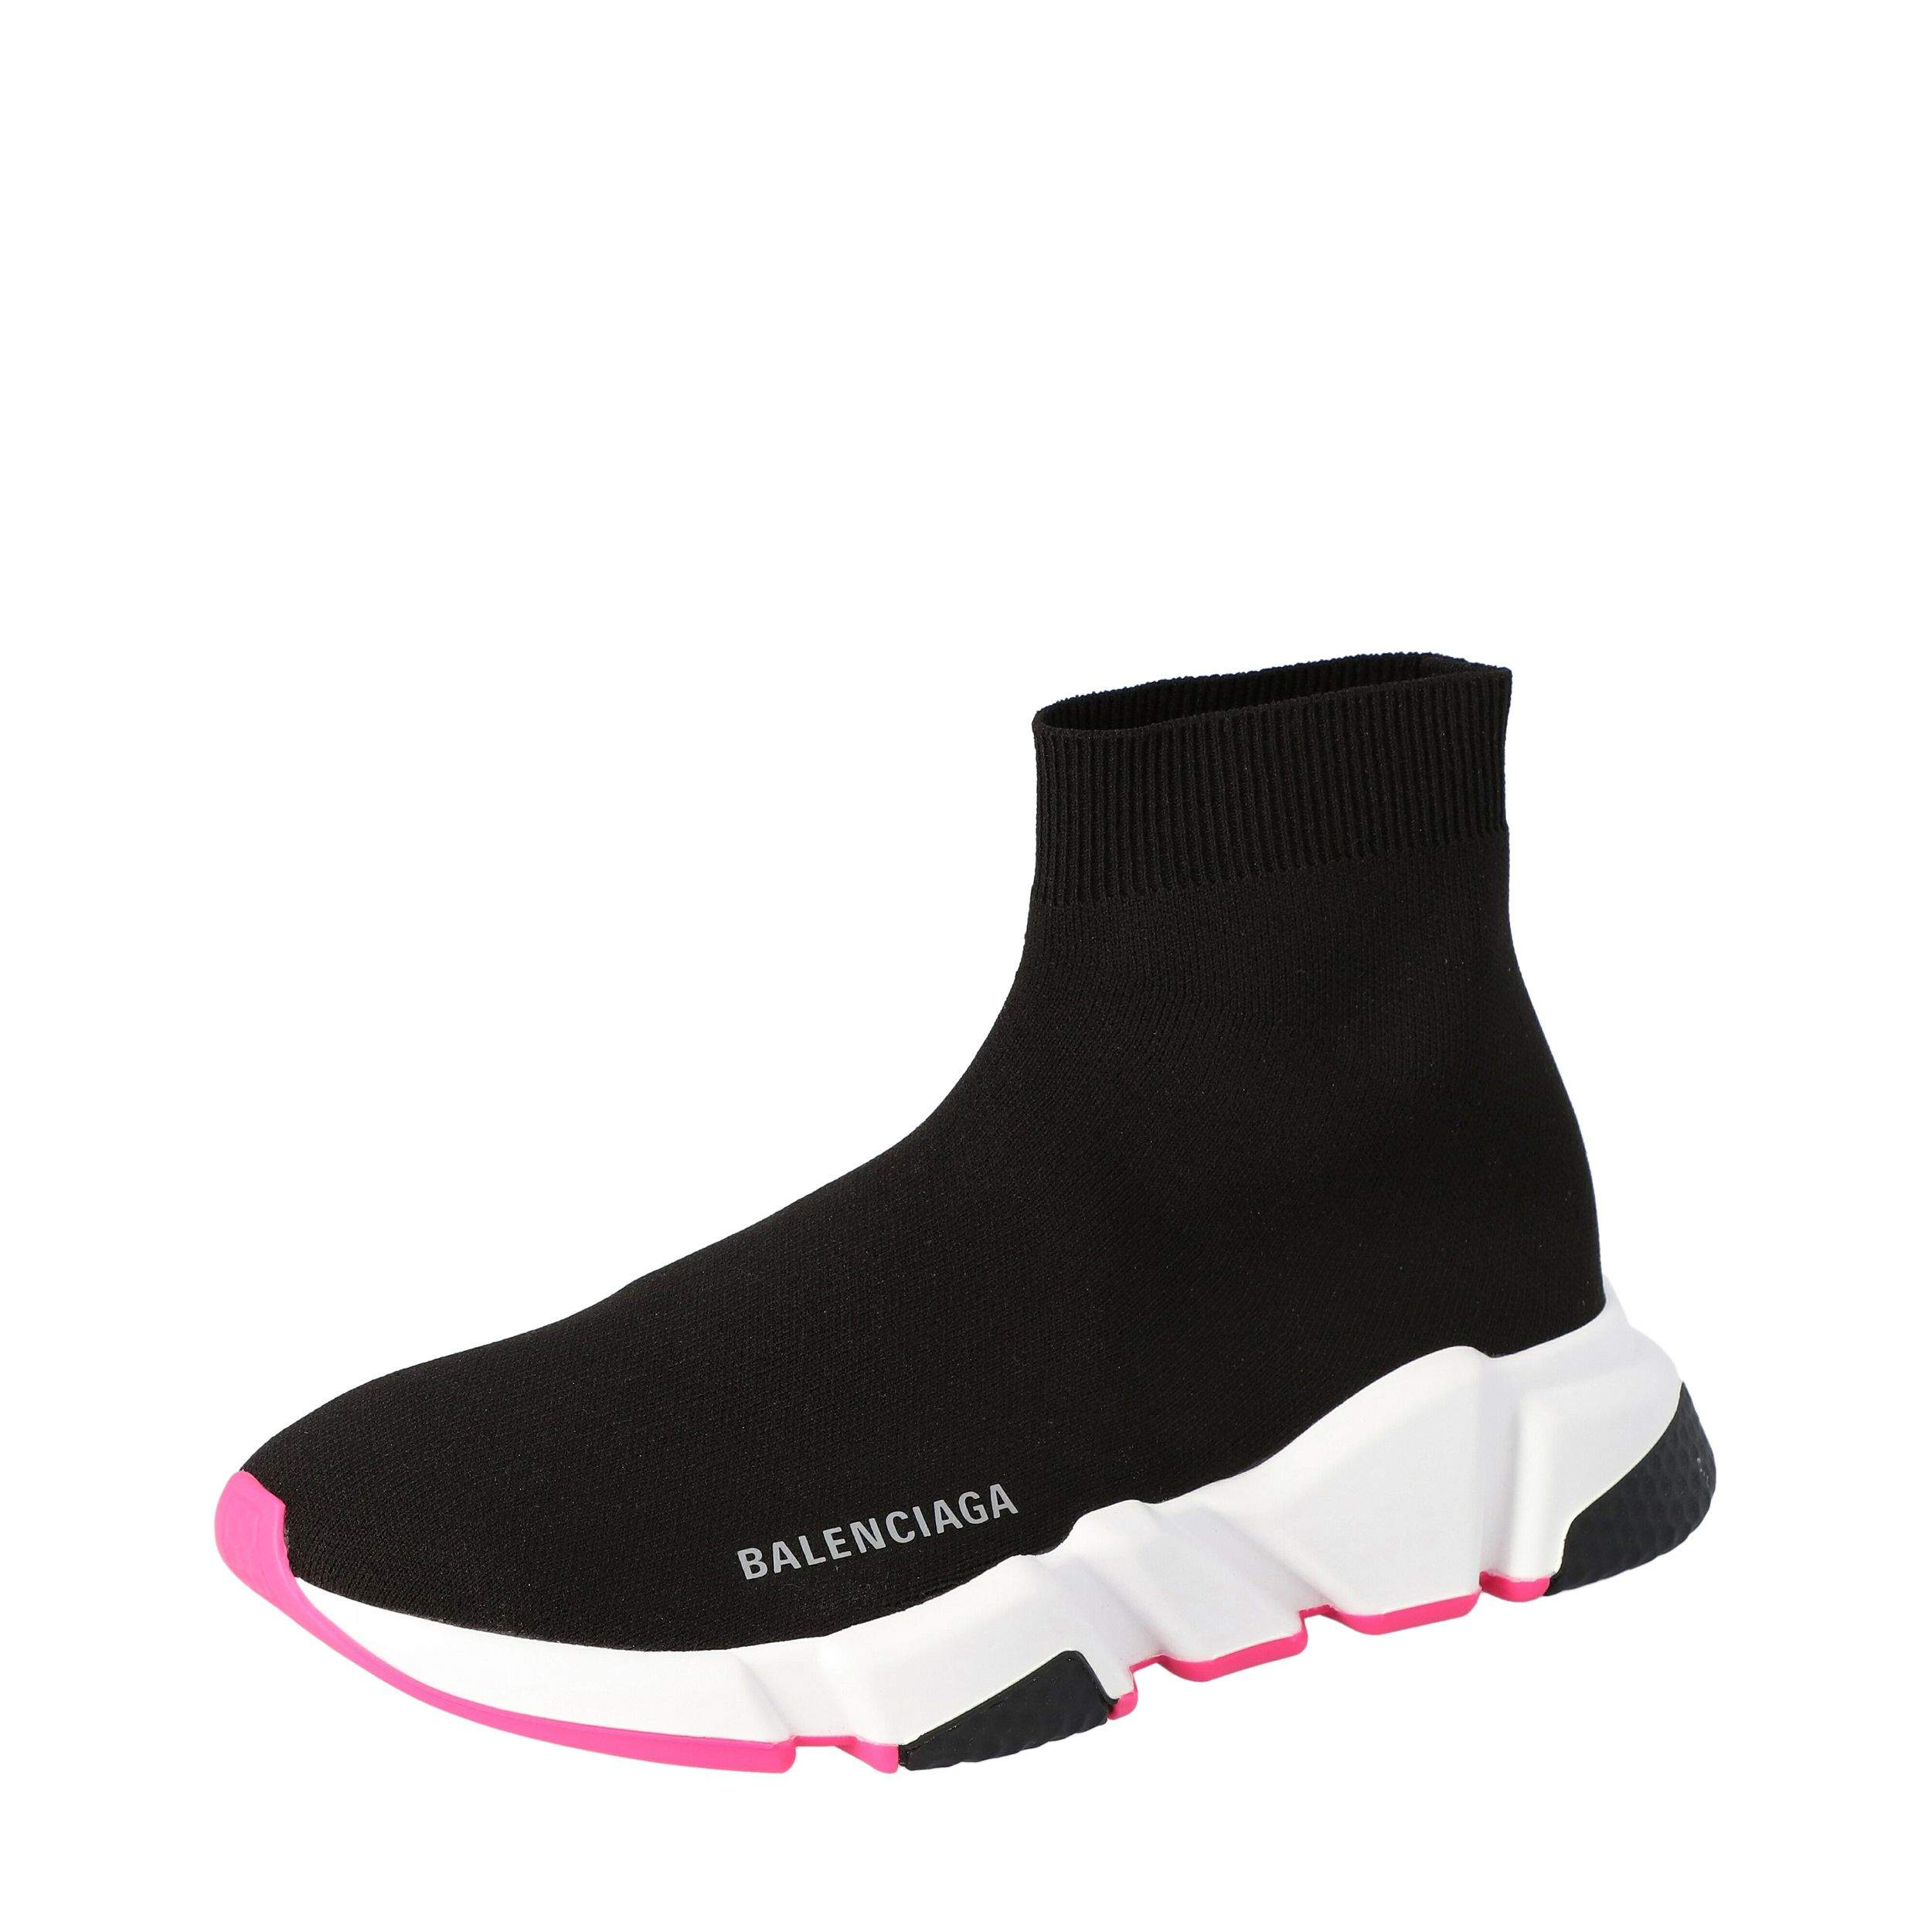 Balenciaga Black/White/Pink Speed Trainers Size 36